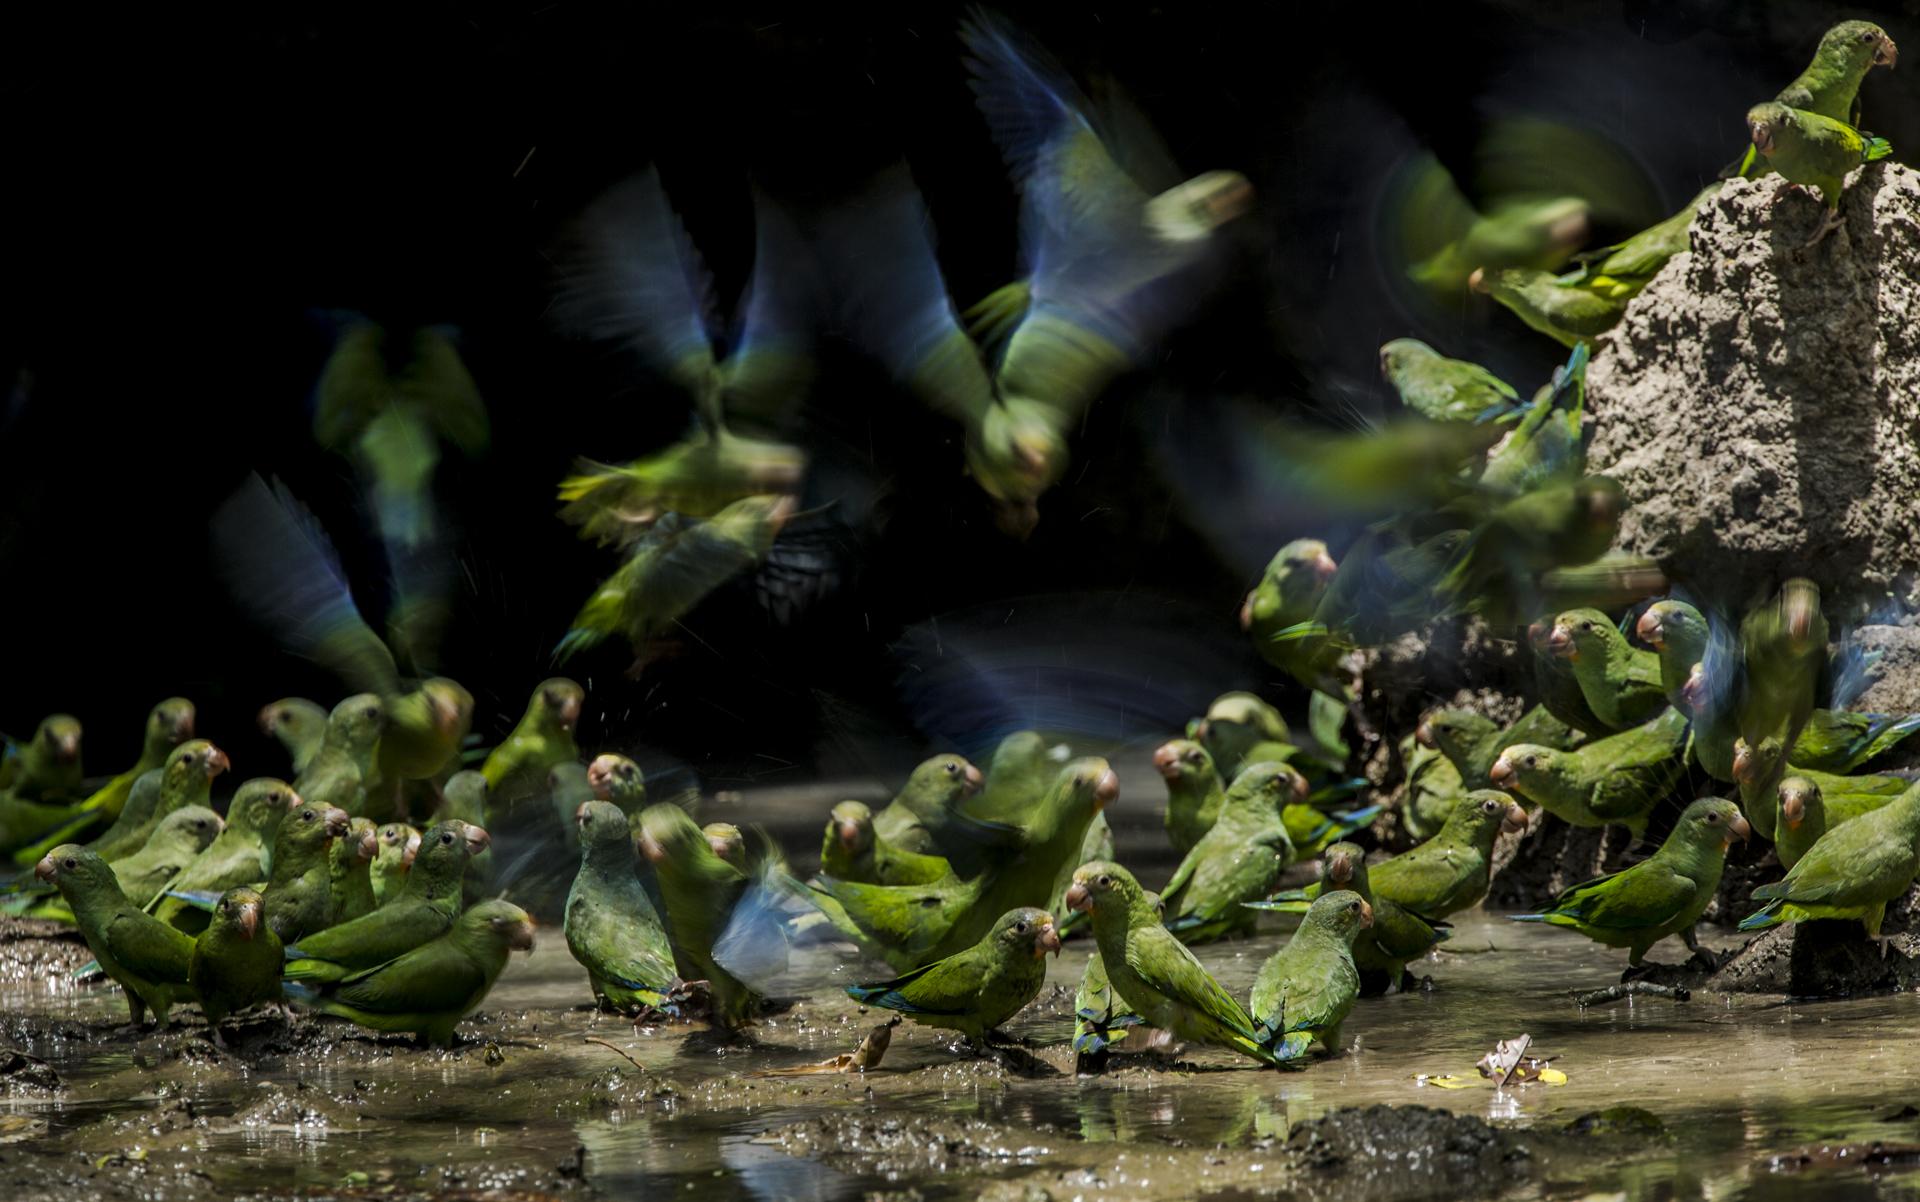 Cobalt winged parakeets at a clay lick in Yasuni NP, Ecuador.